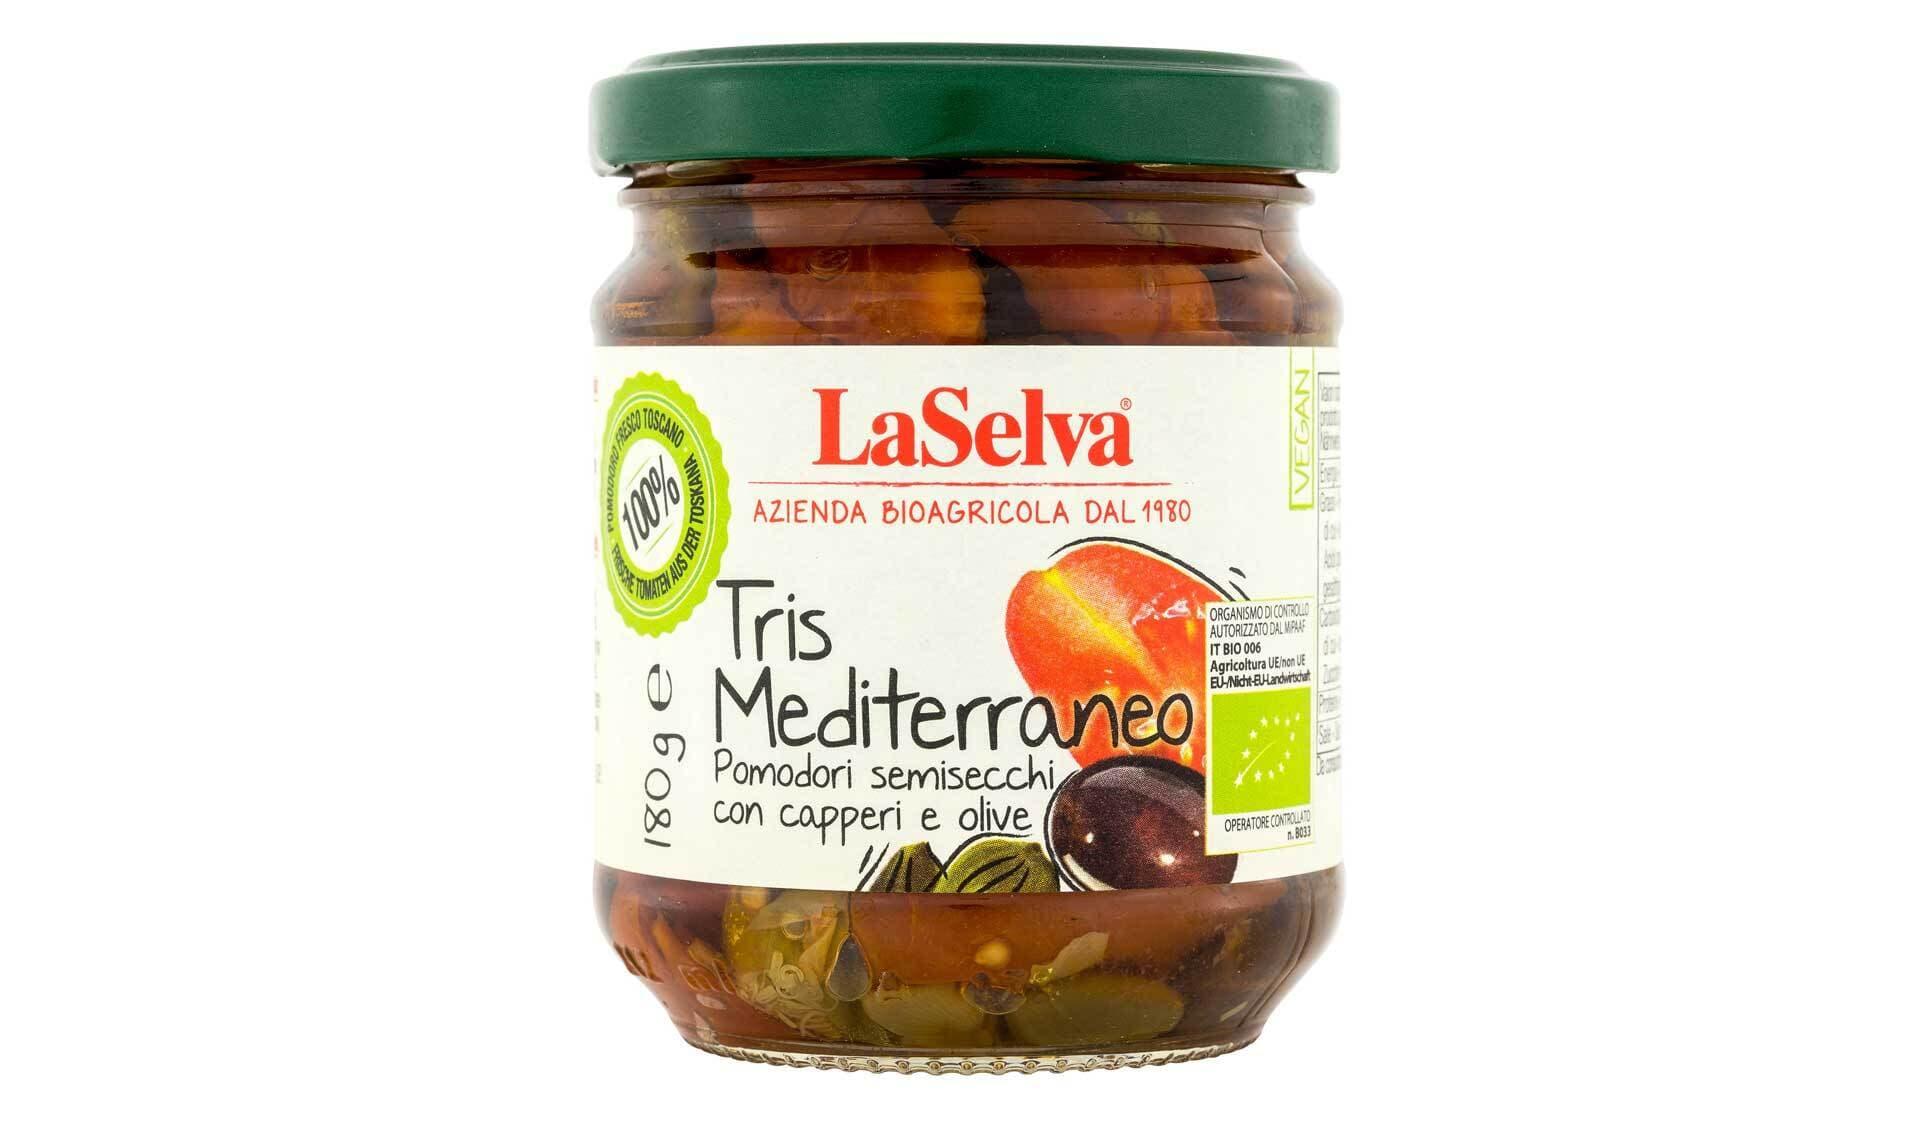 Laselva Tris Mediterraneo